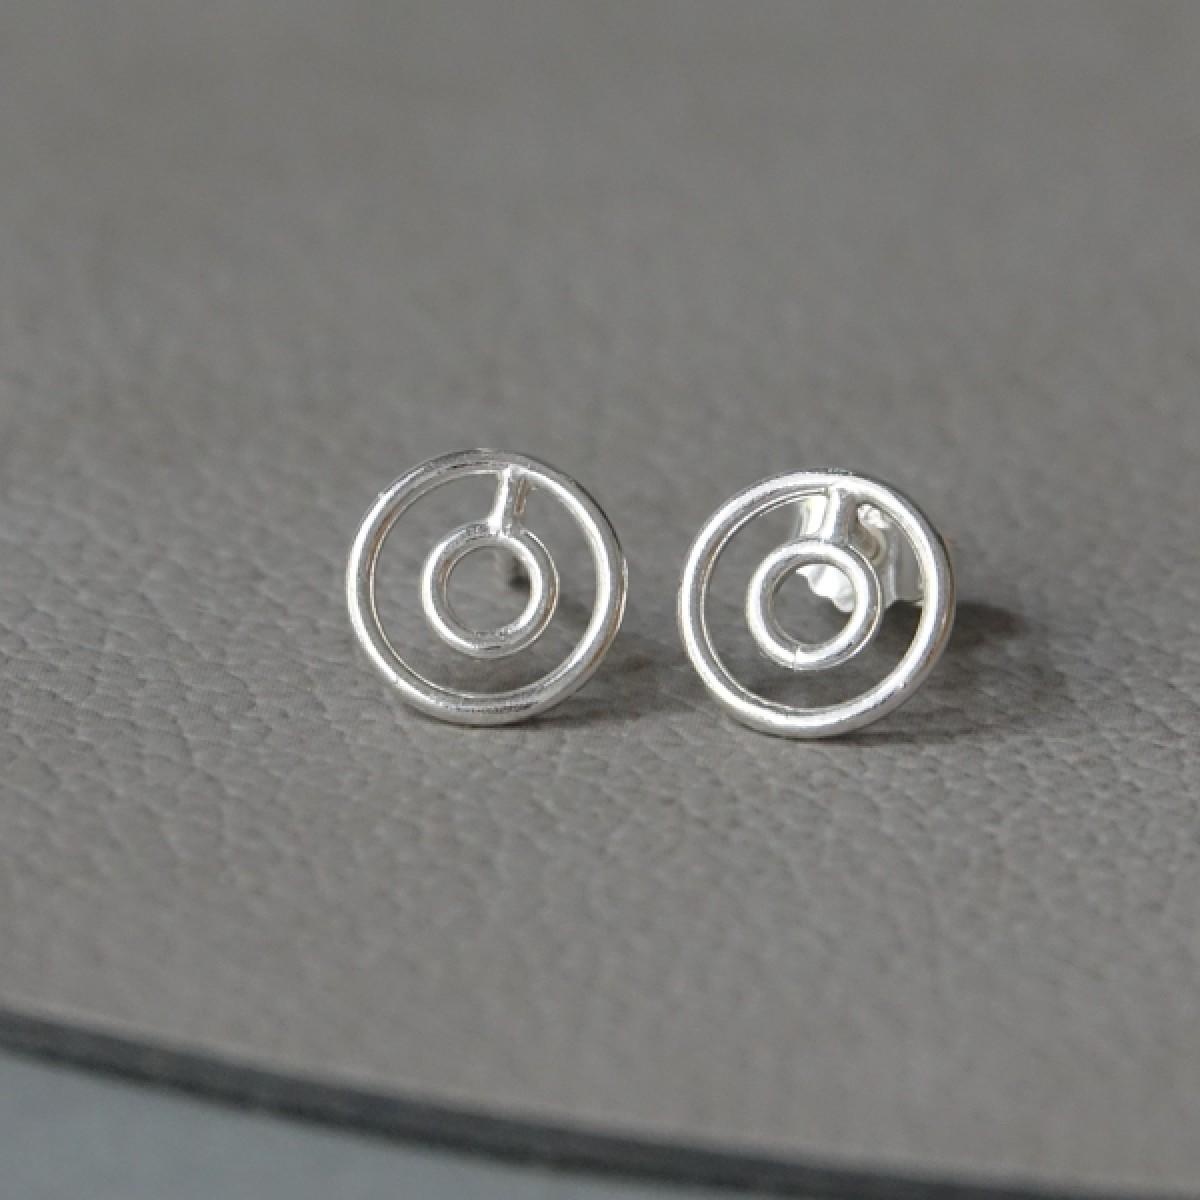 Ohrkreise Nr. 9 - margaritifera - Ohrstecker - Silber 925